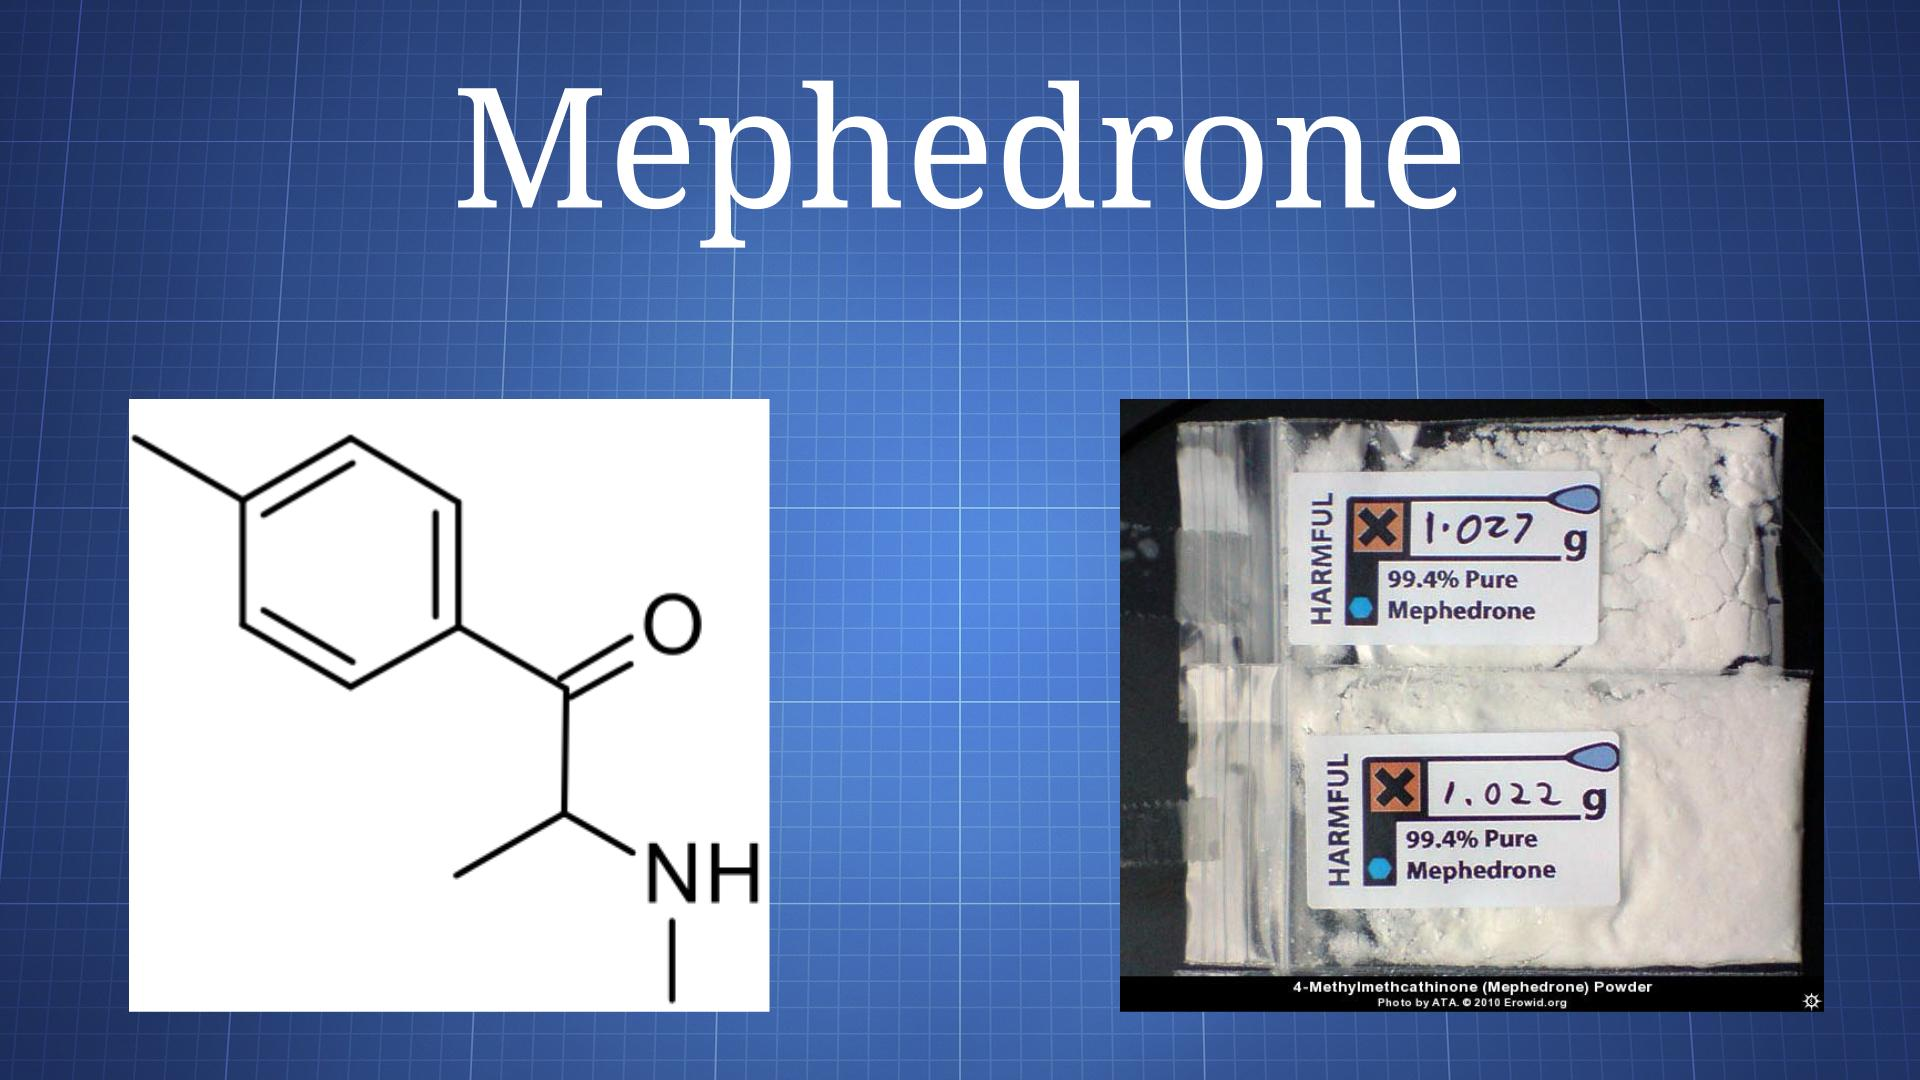 4-MMC (Mephedrone) - The Drug Classroom